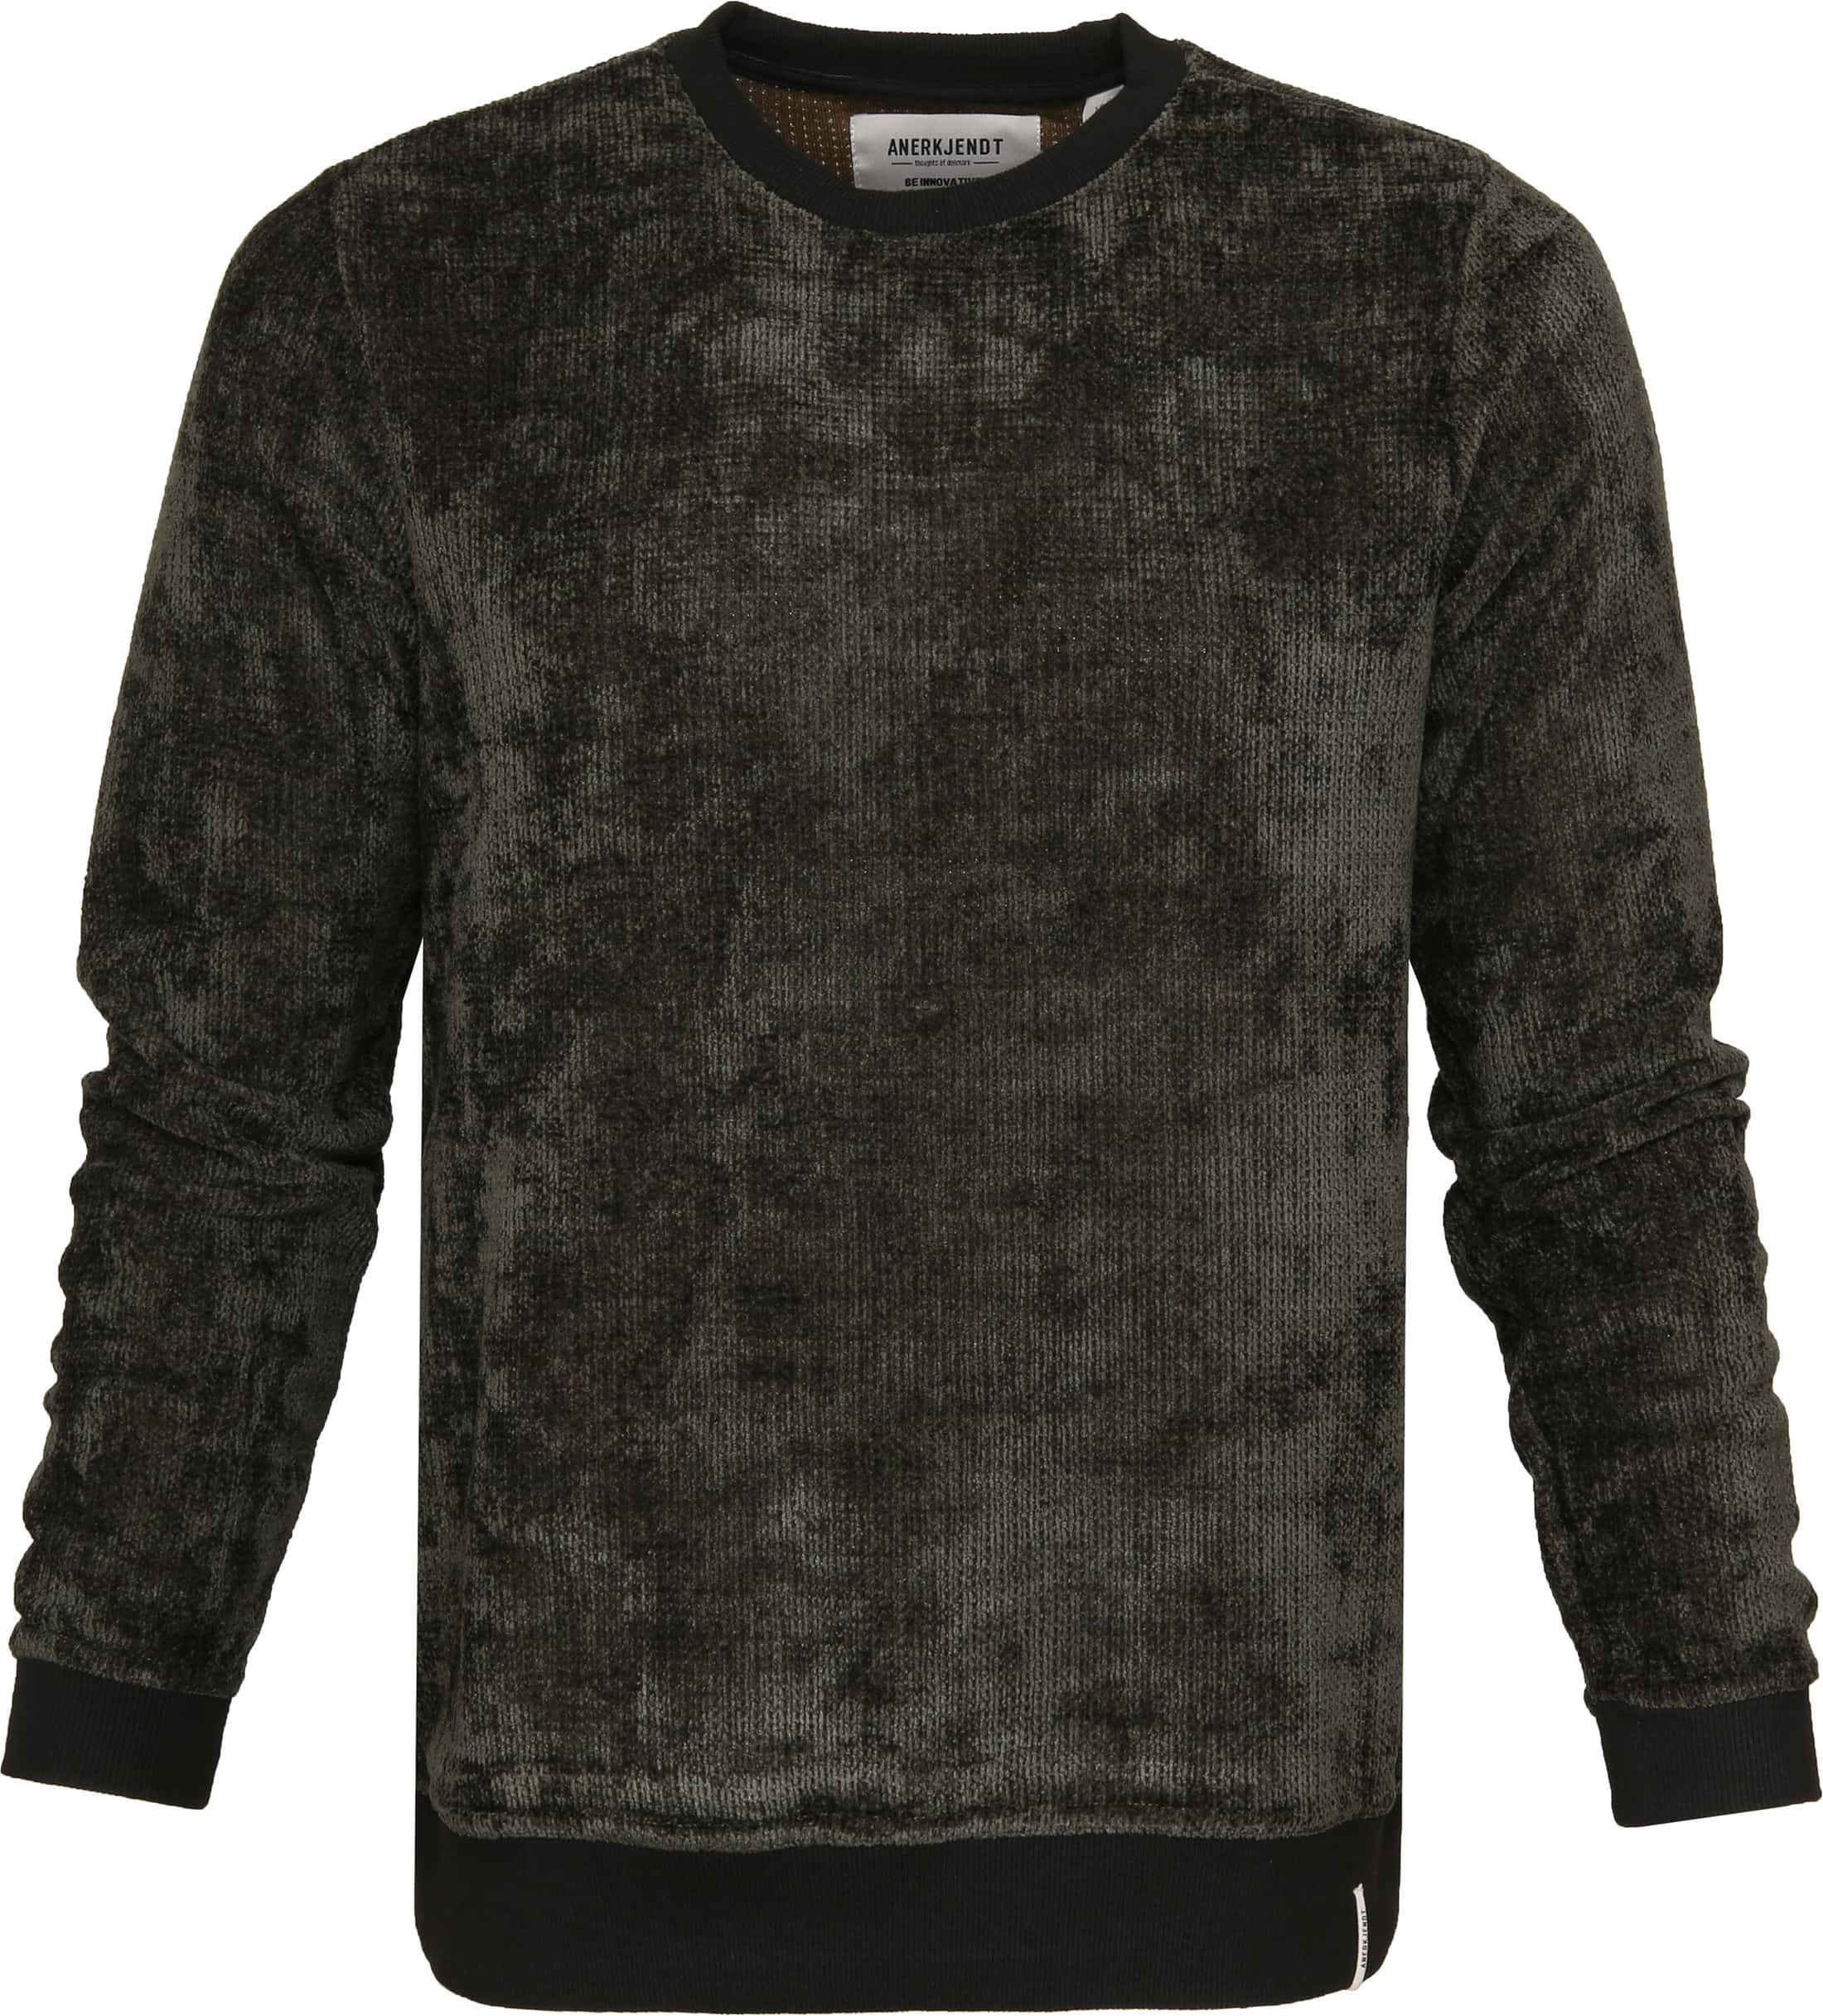 Anerkjendt Akalex Sweater Dark Green foto 0